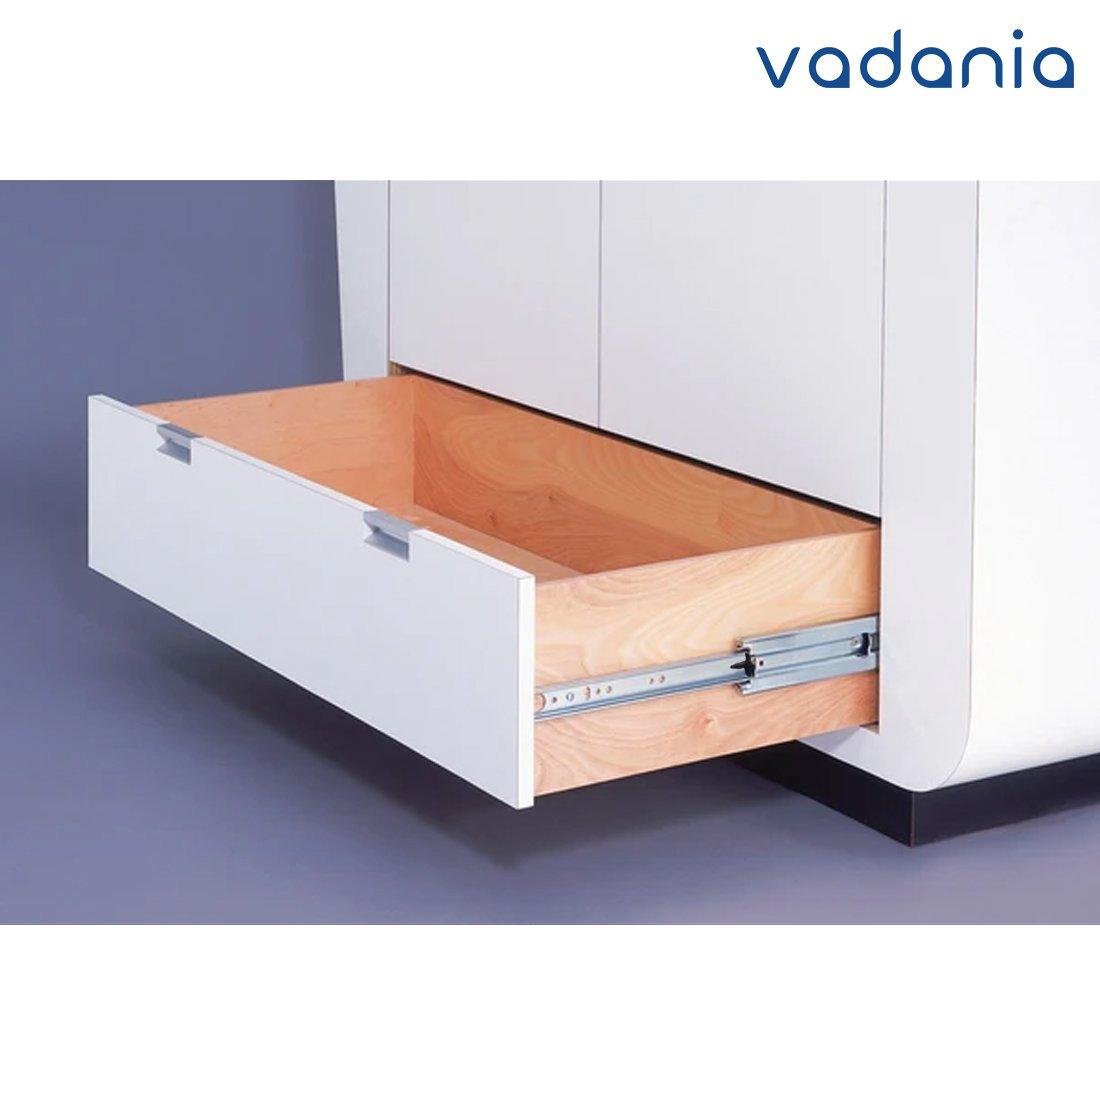 vadania VA1045 drawer slides